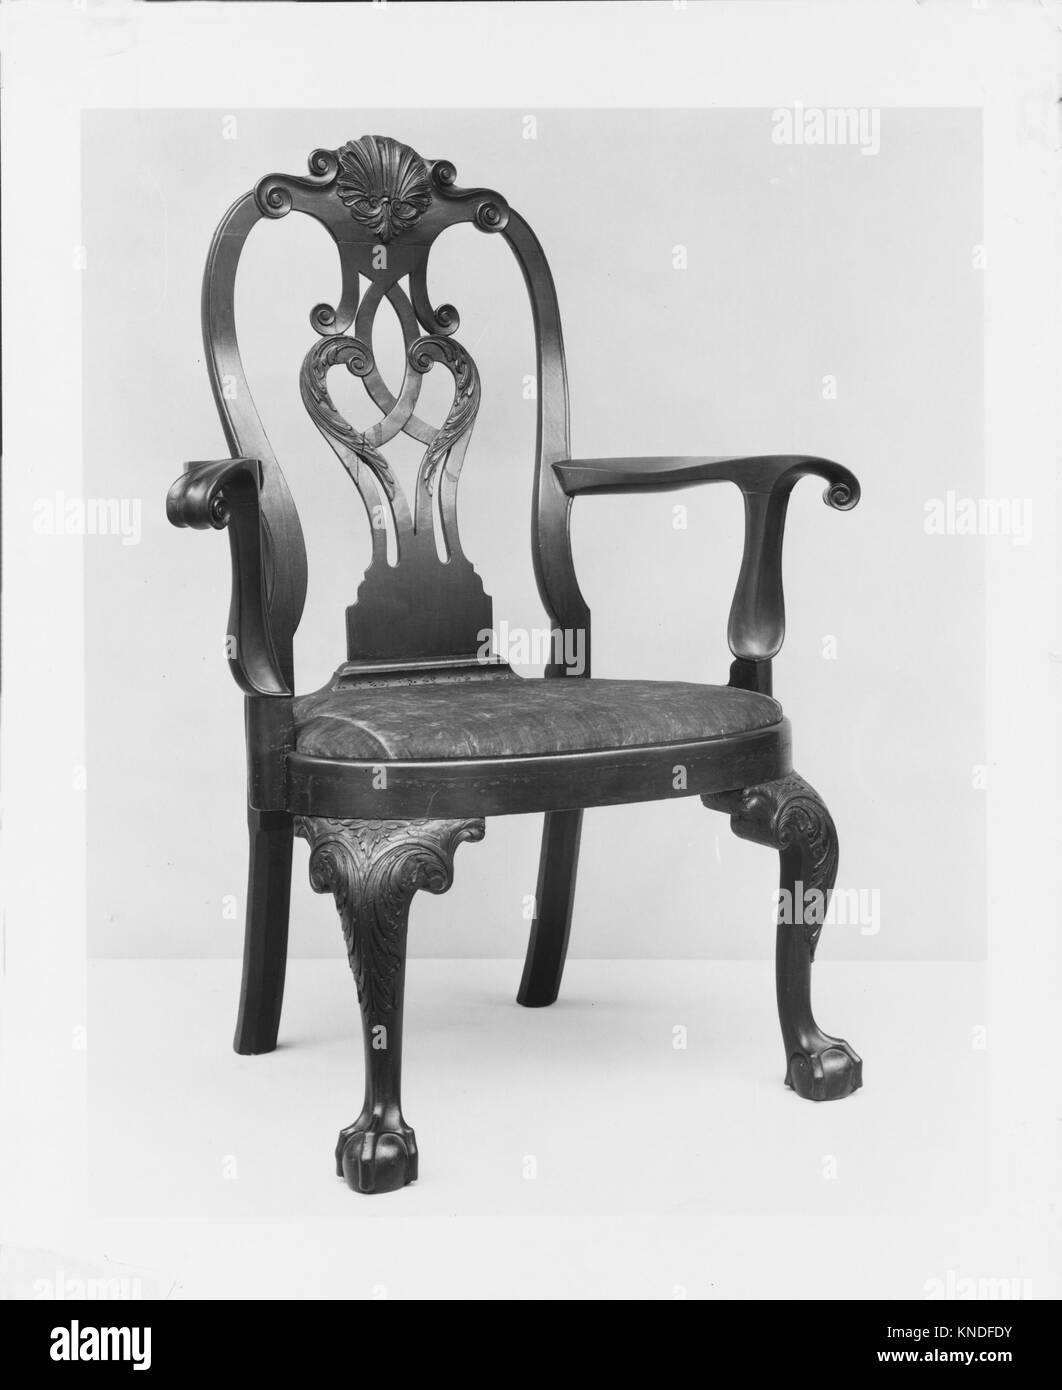 Armchair MET 61554 182 American, Armchair, ca. 1755, Mahogany, 44 x 33 1/4 x 21 1/2 in. (111.8 x 84.5 x 54.6 cm). - Stock Image